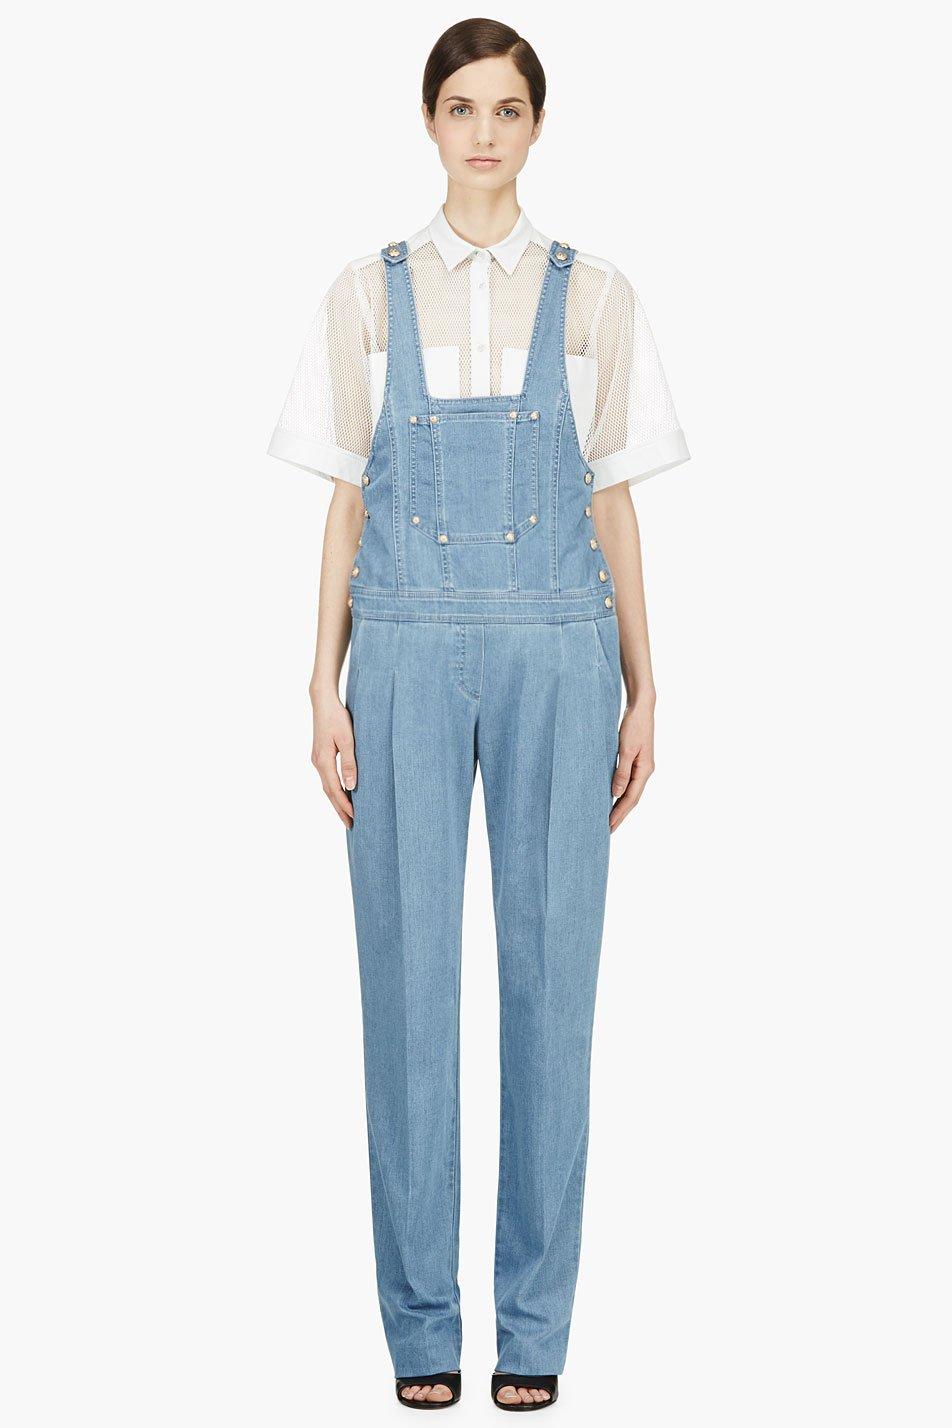 balmain blue and gold buttoned denim overalls